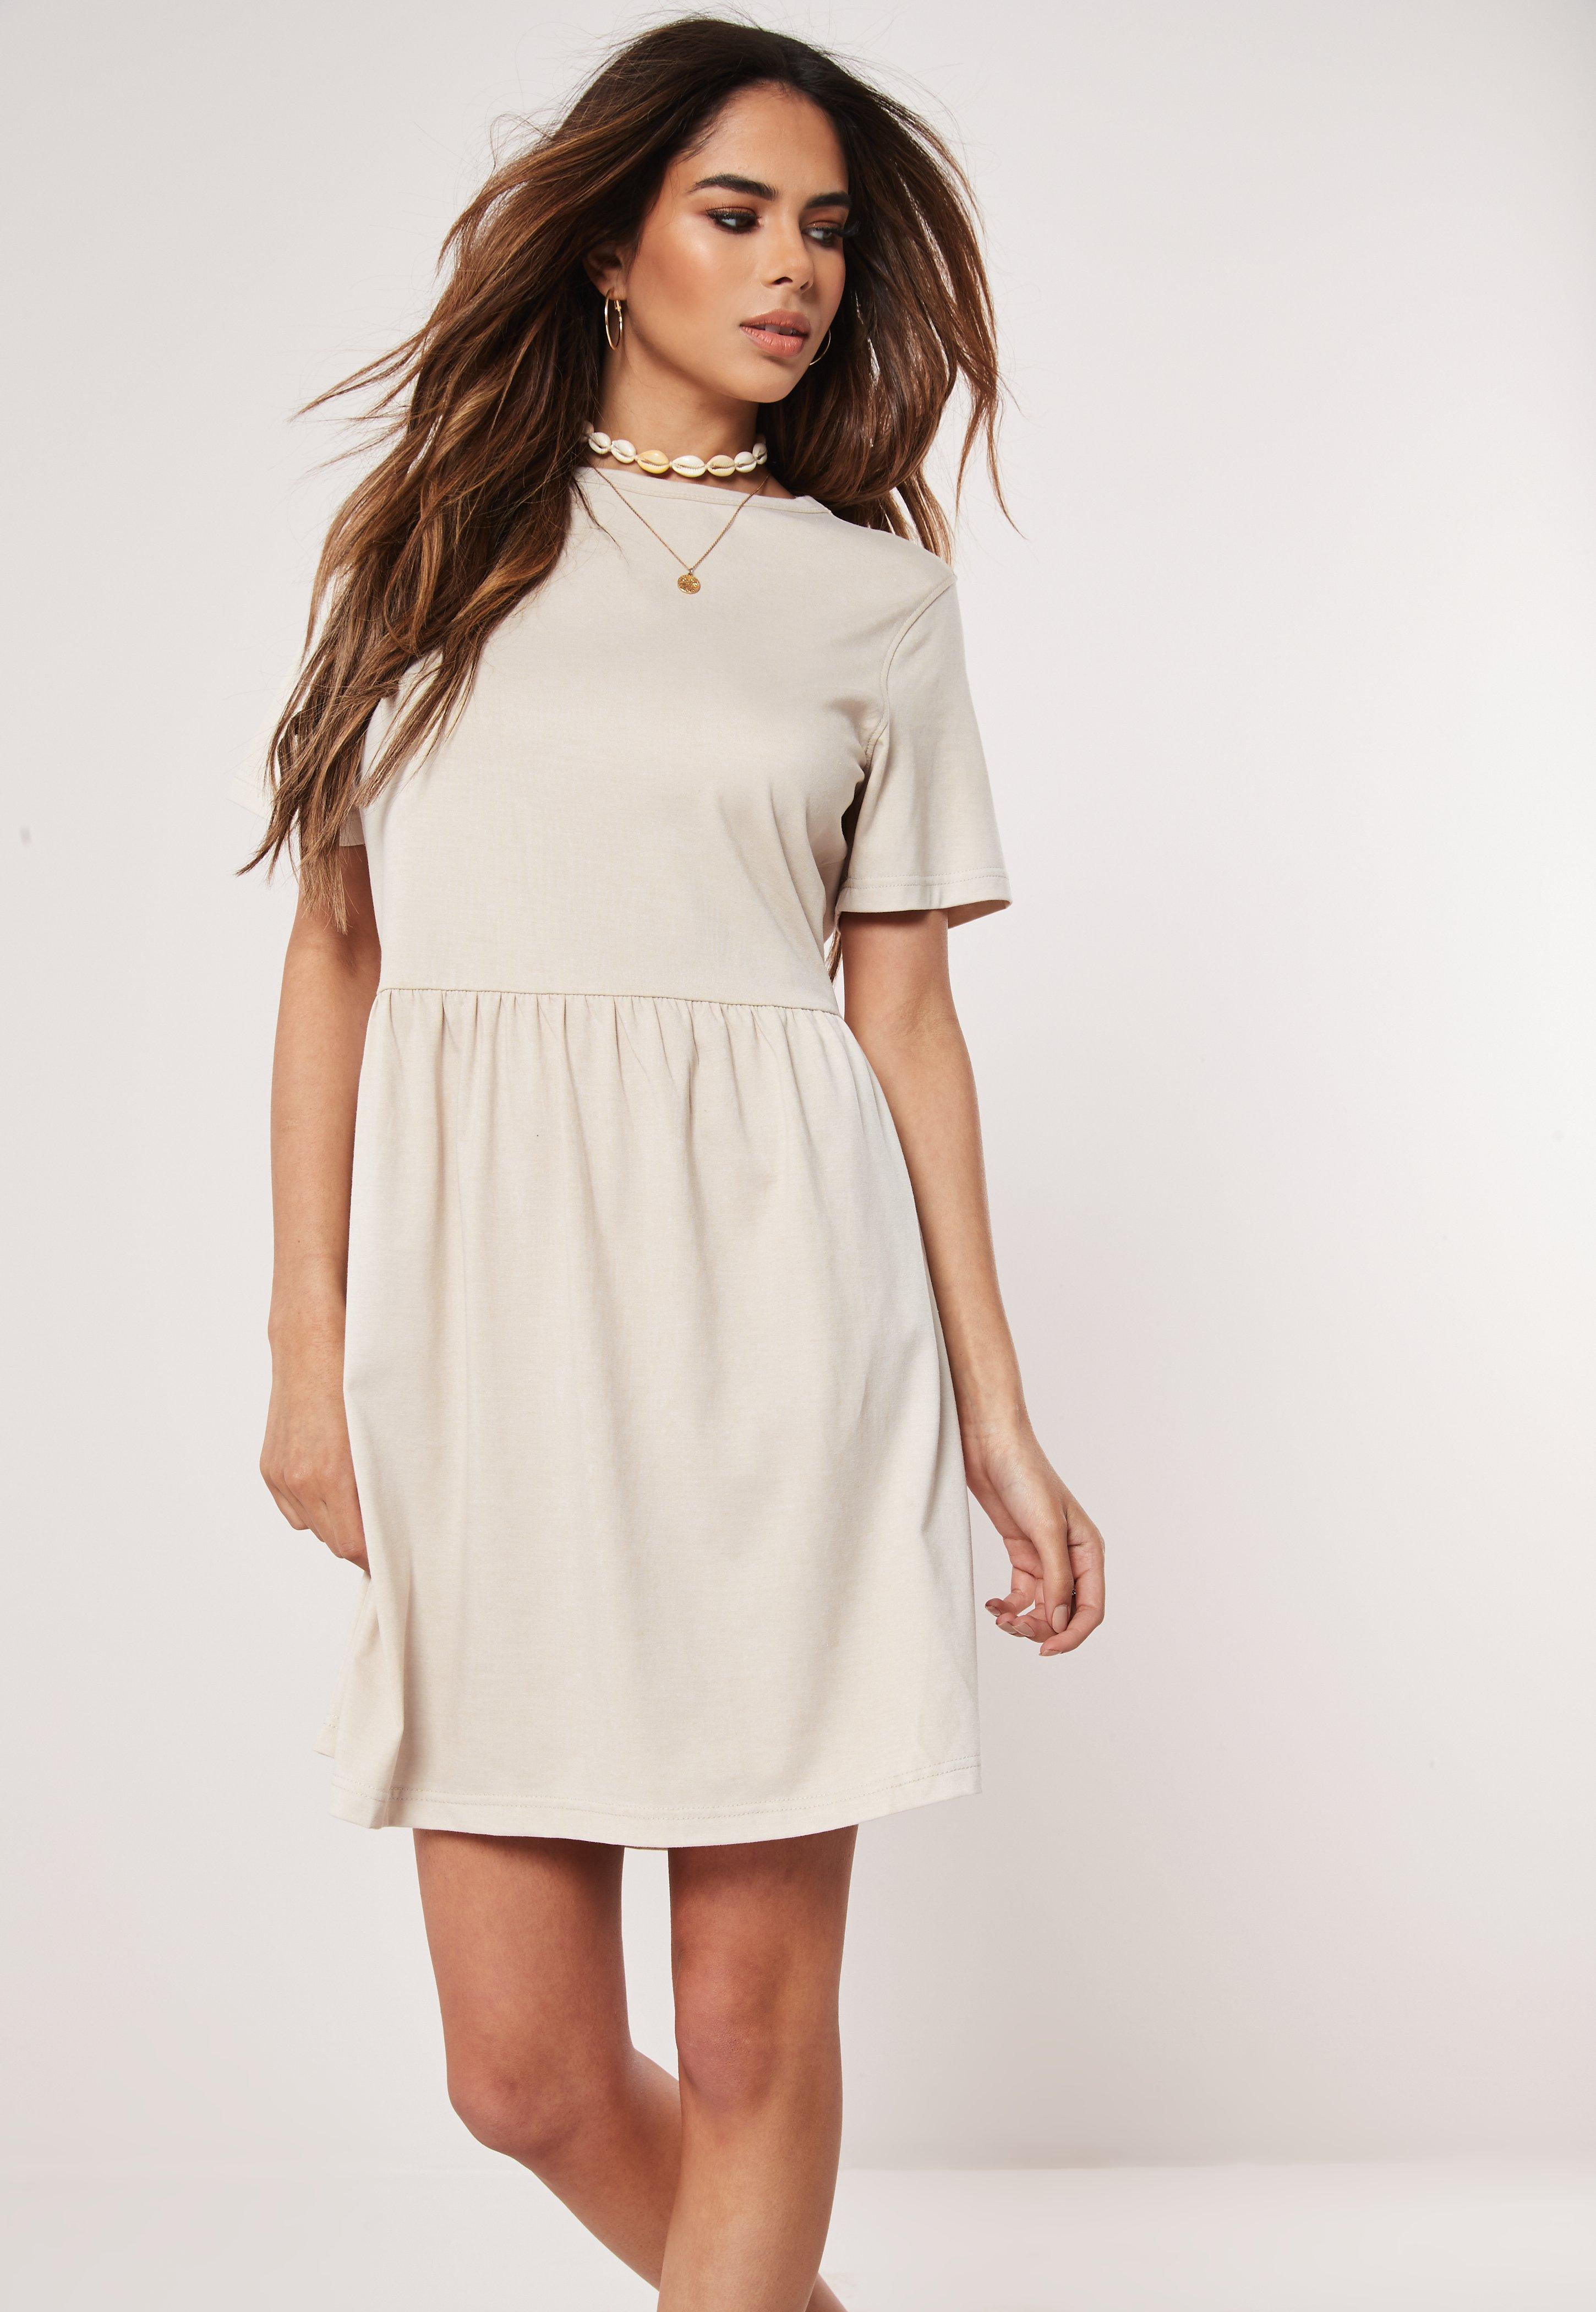 ffa3a9cb3a5 Dresses UK